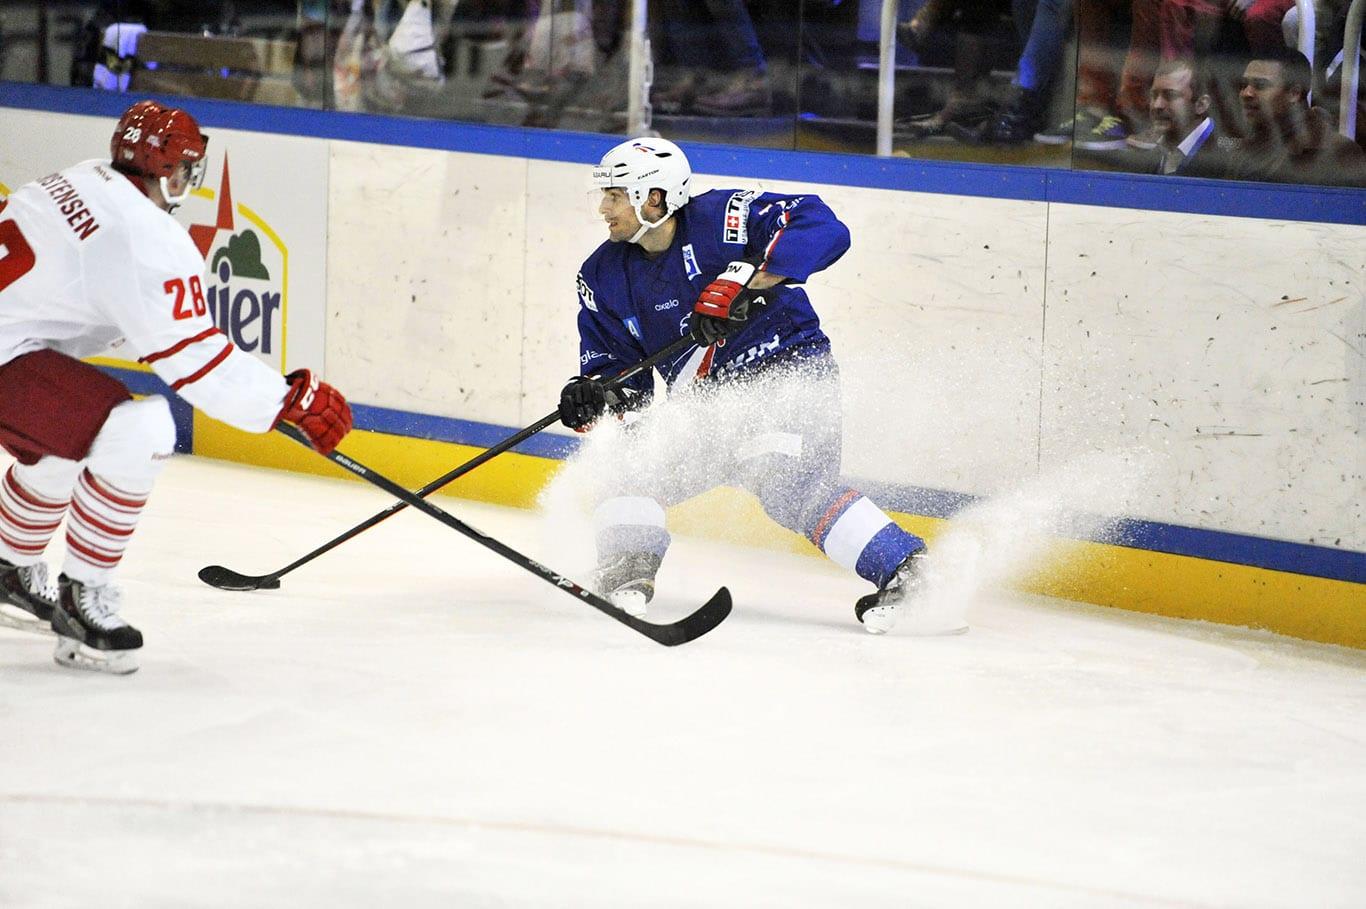 ice hockey Courchevel